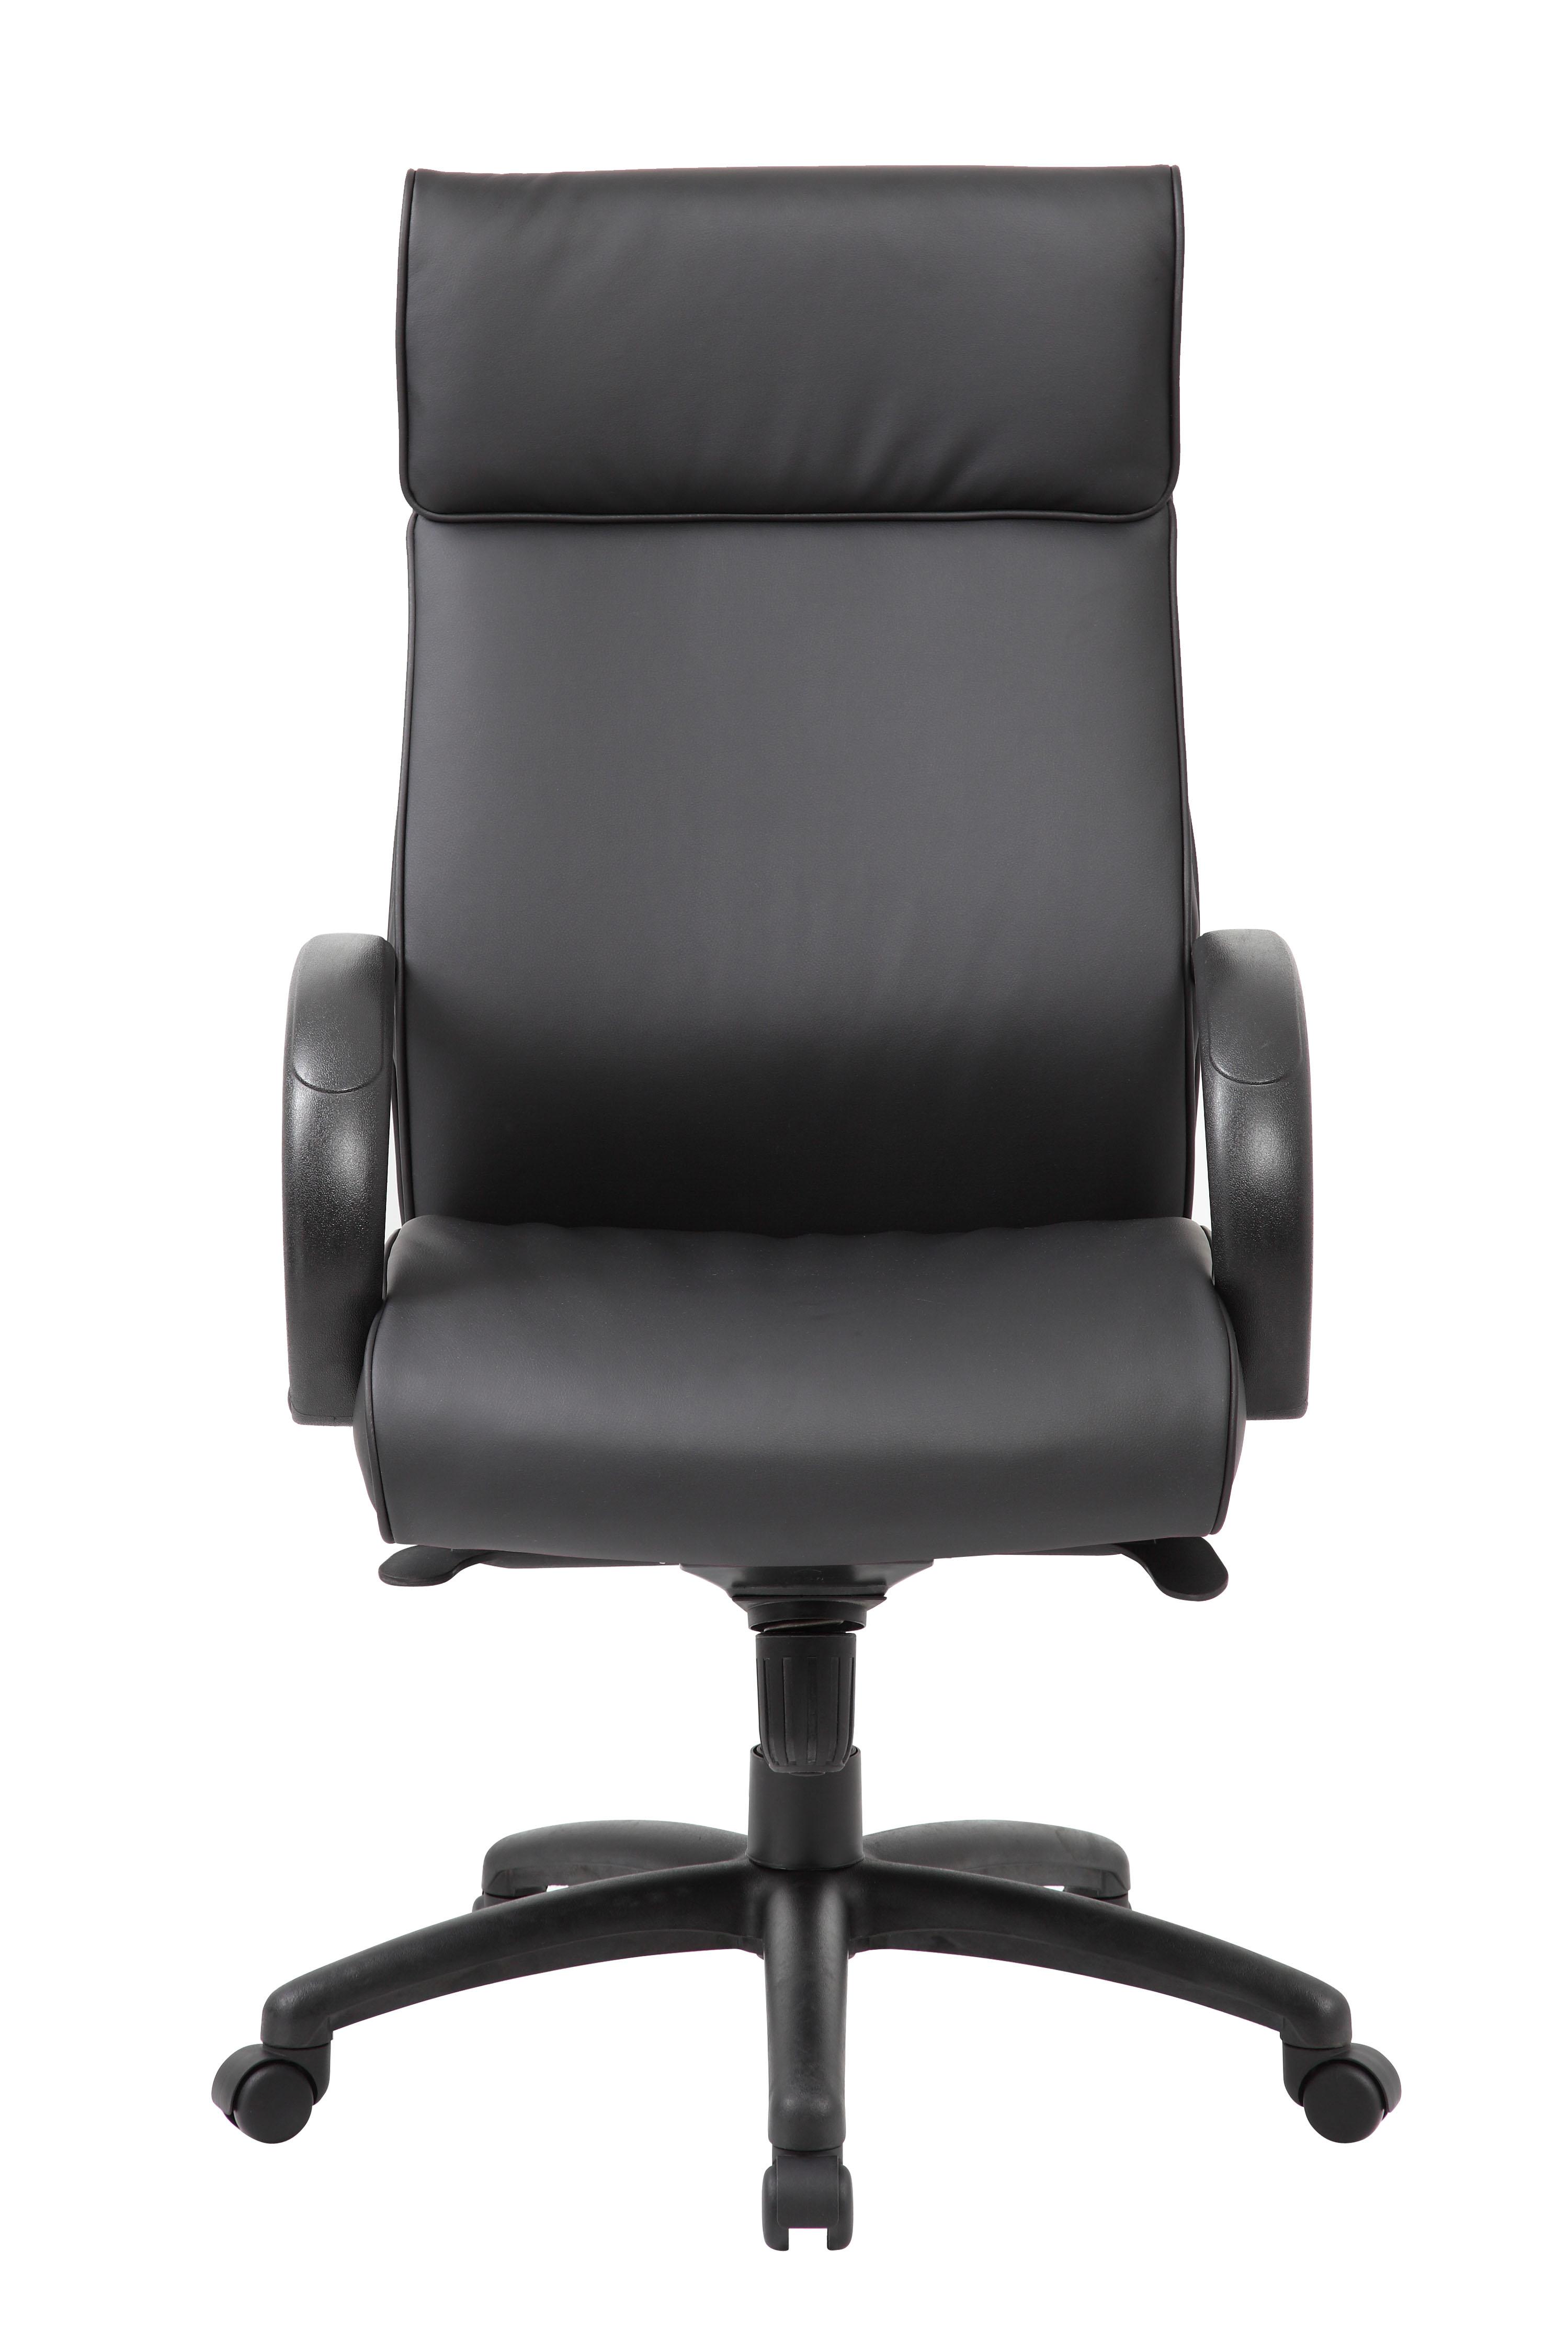 Boss High Back Executive Chair Black Finish Black Upholstery